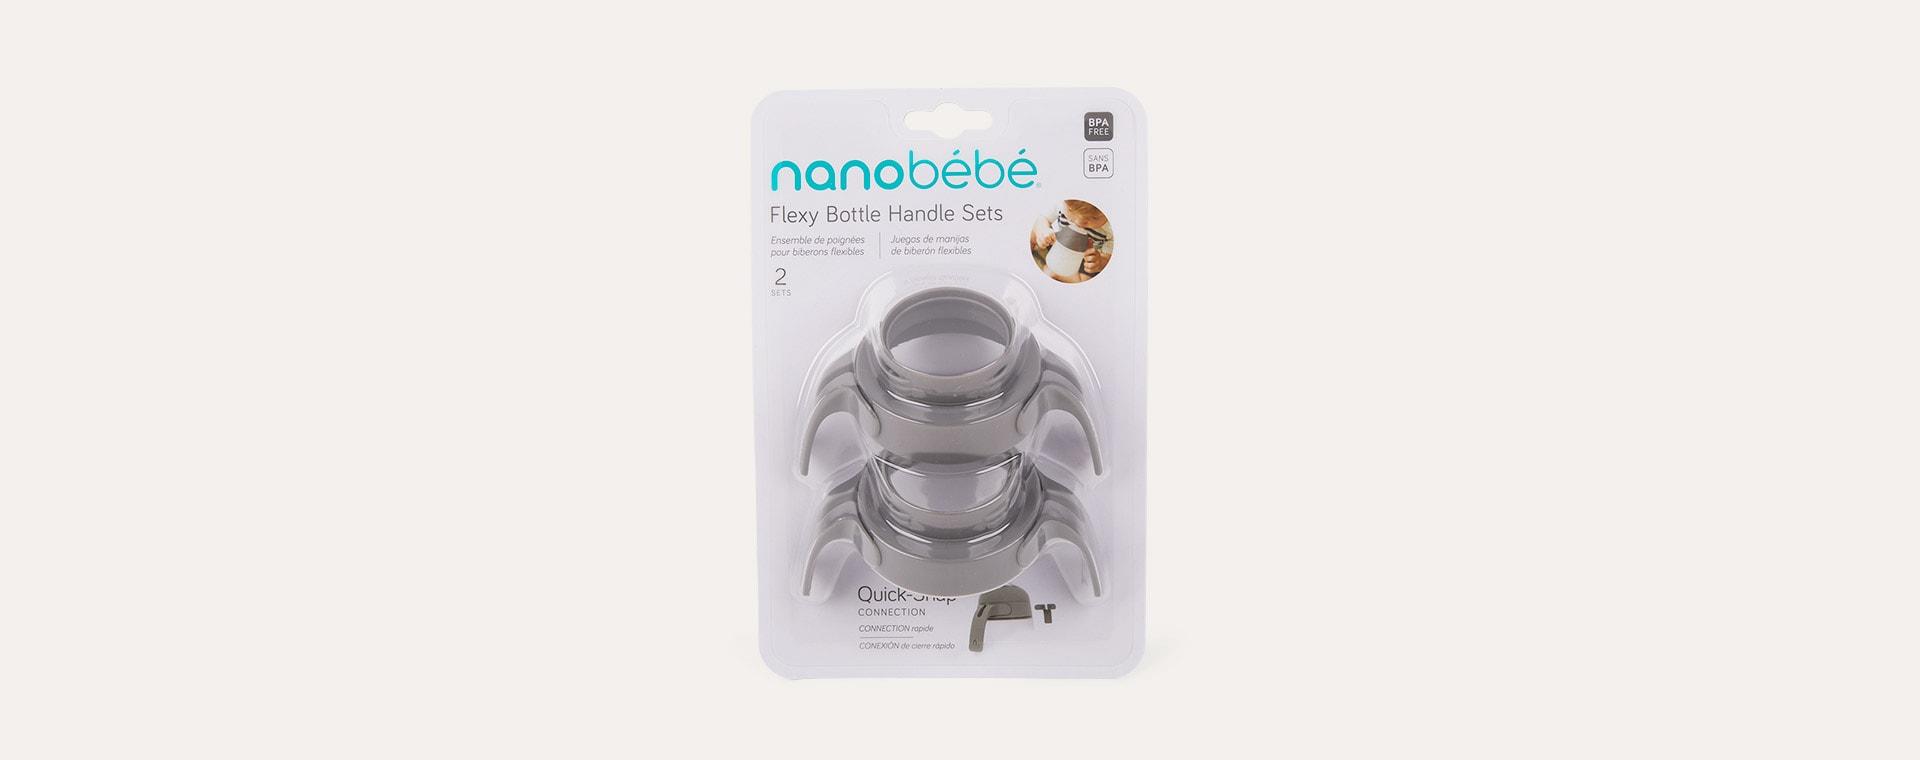 Grey nanobébé Silicone Bottle Handles